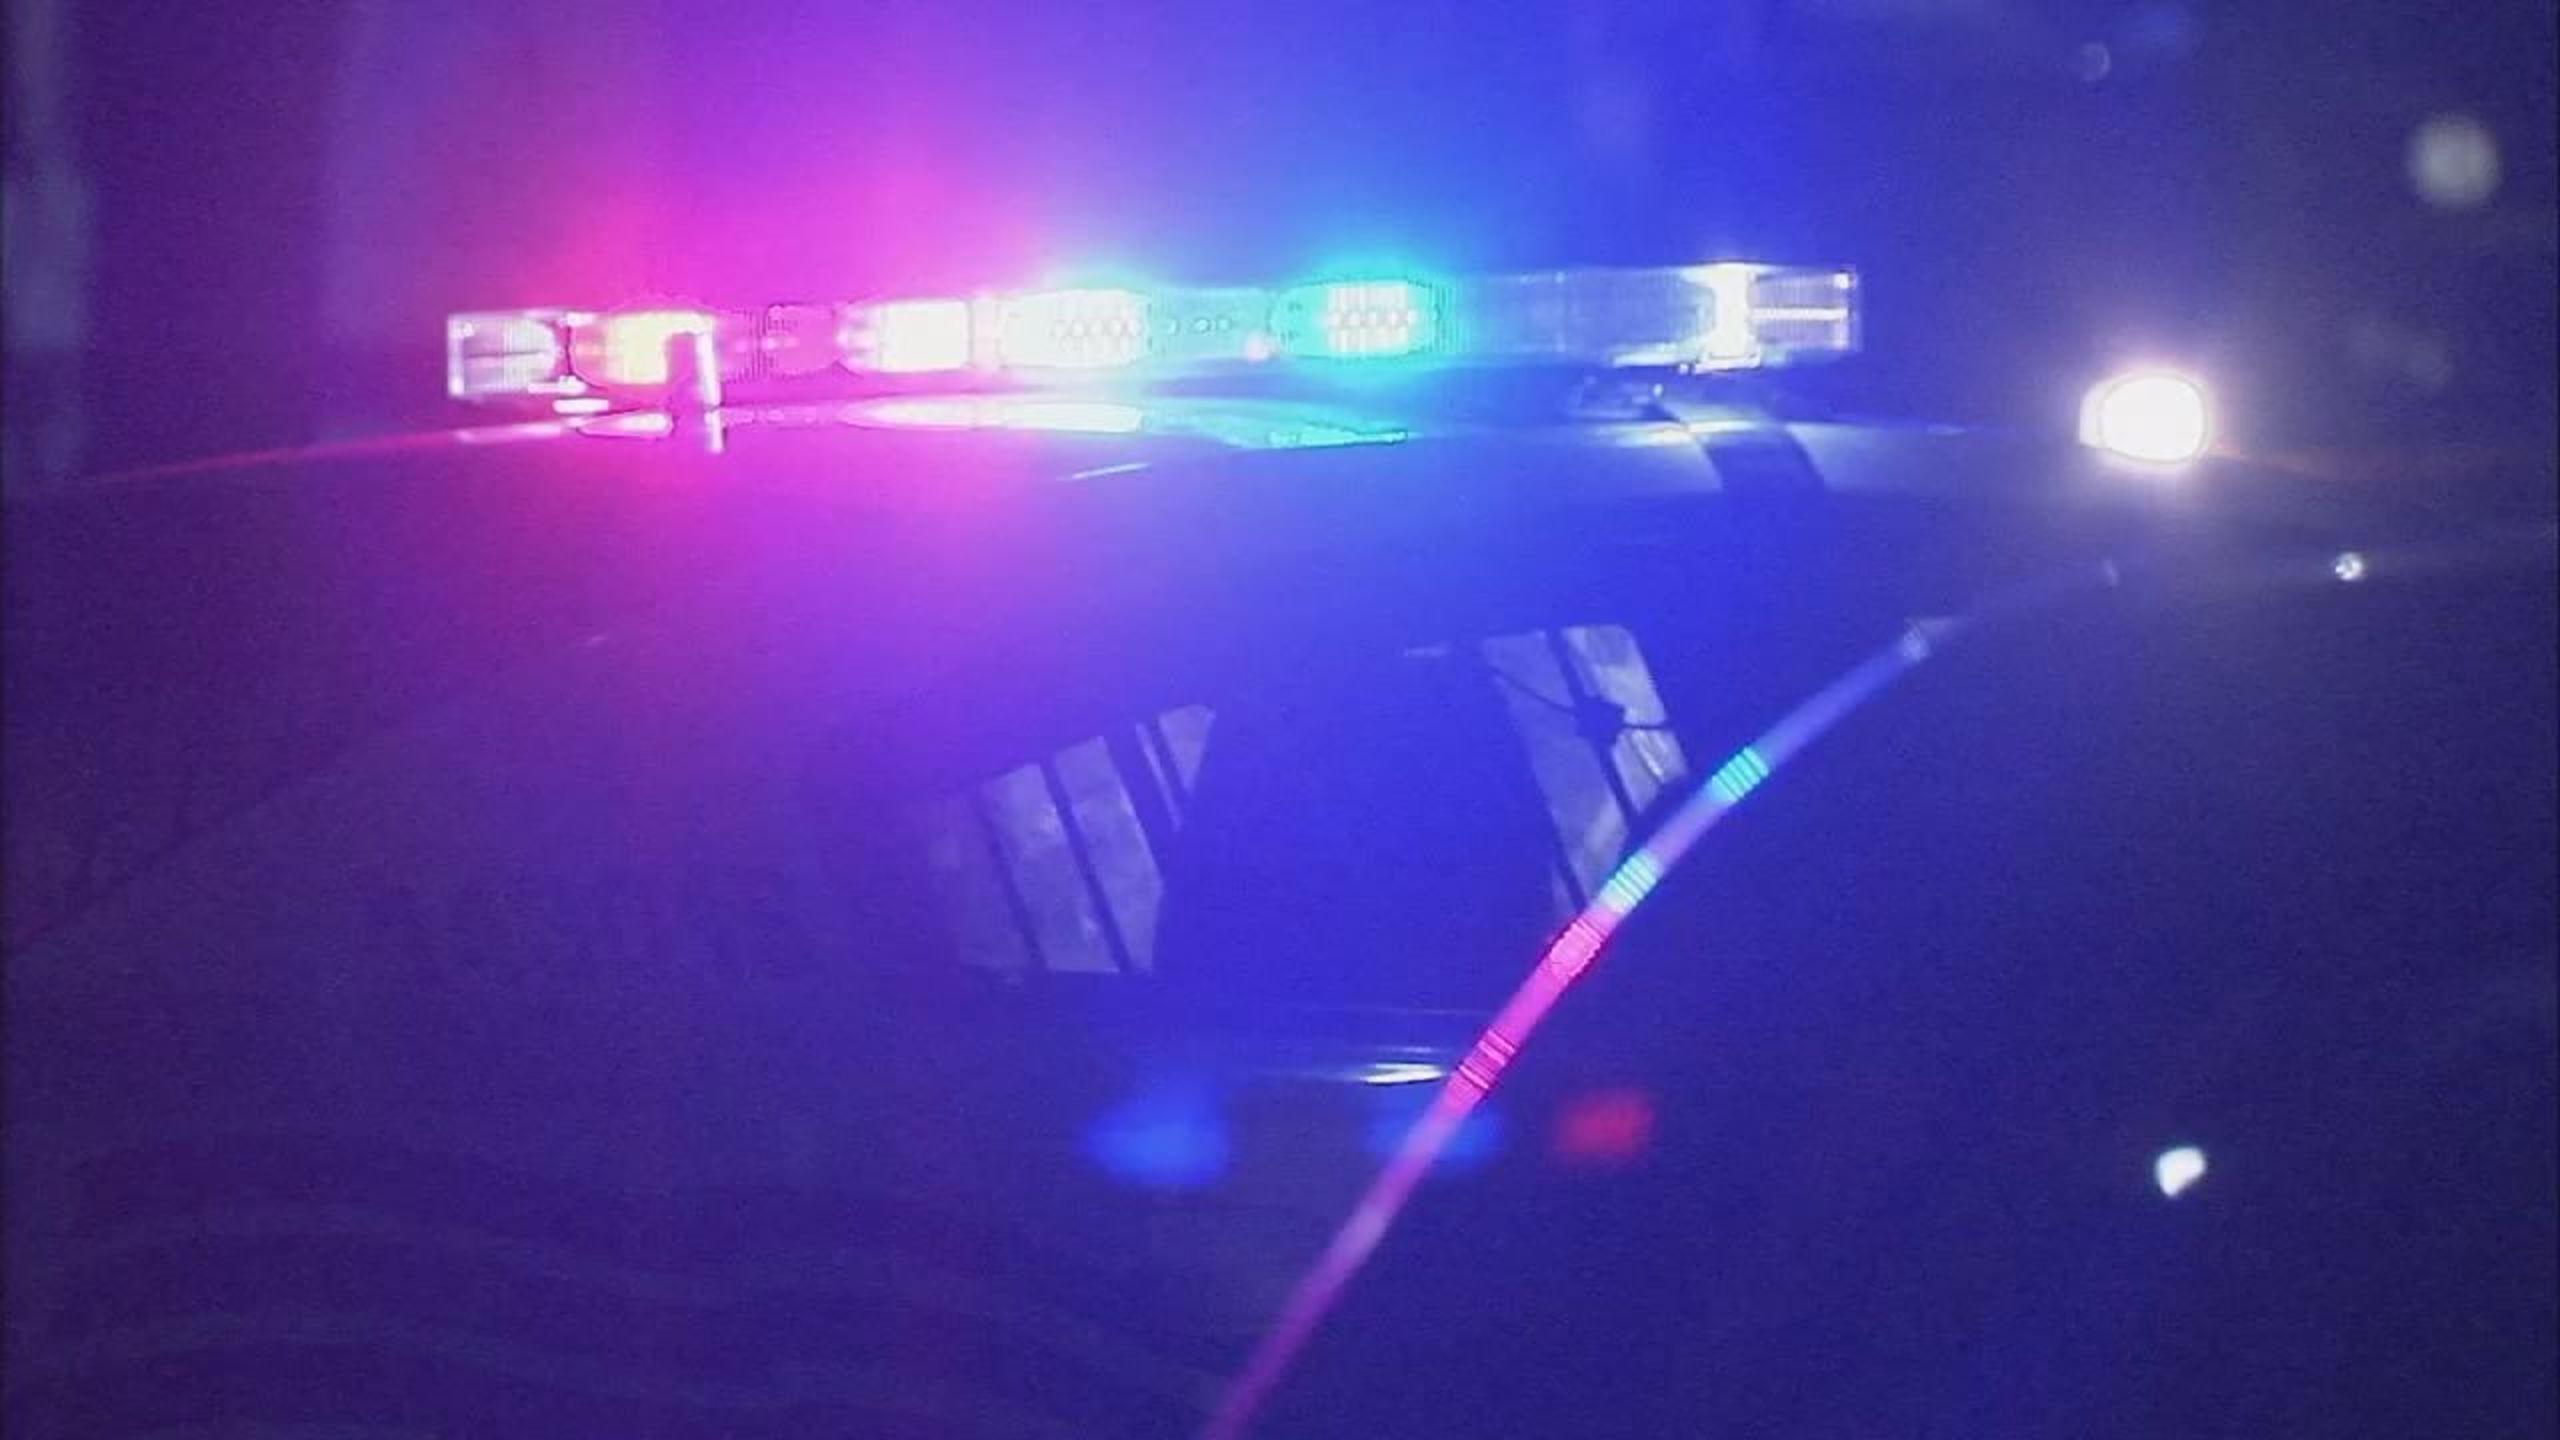 Multiple suspects in stolen short bus arrested for burglary spree in Austin